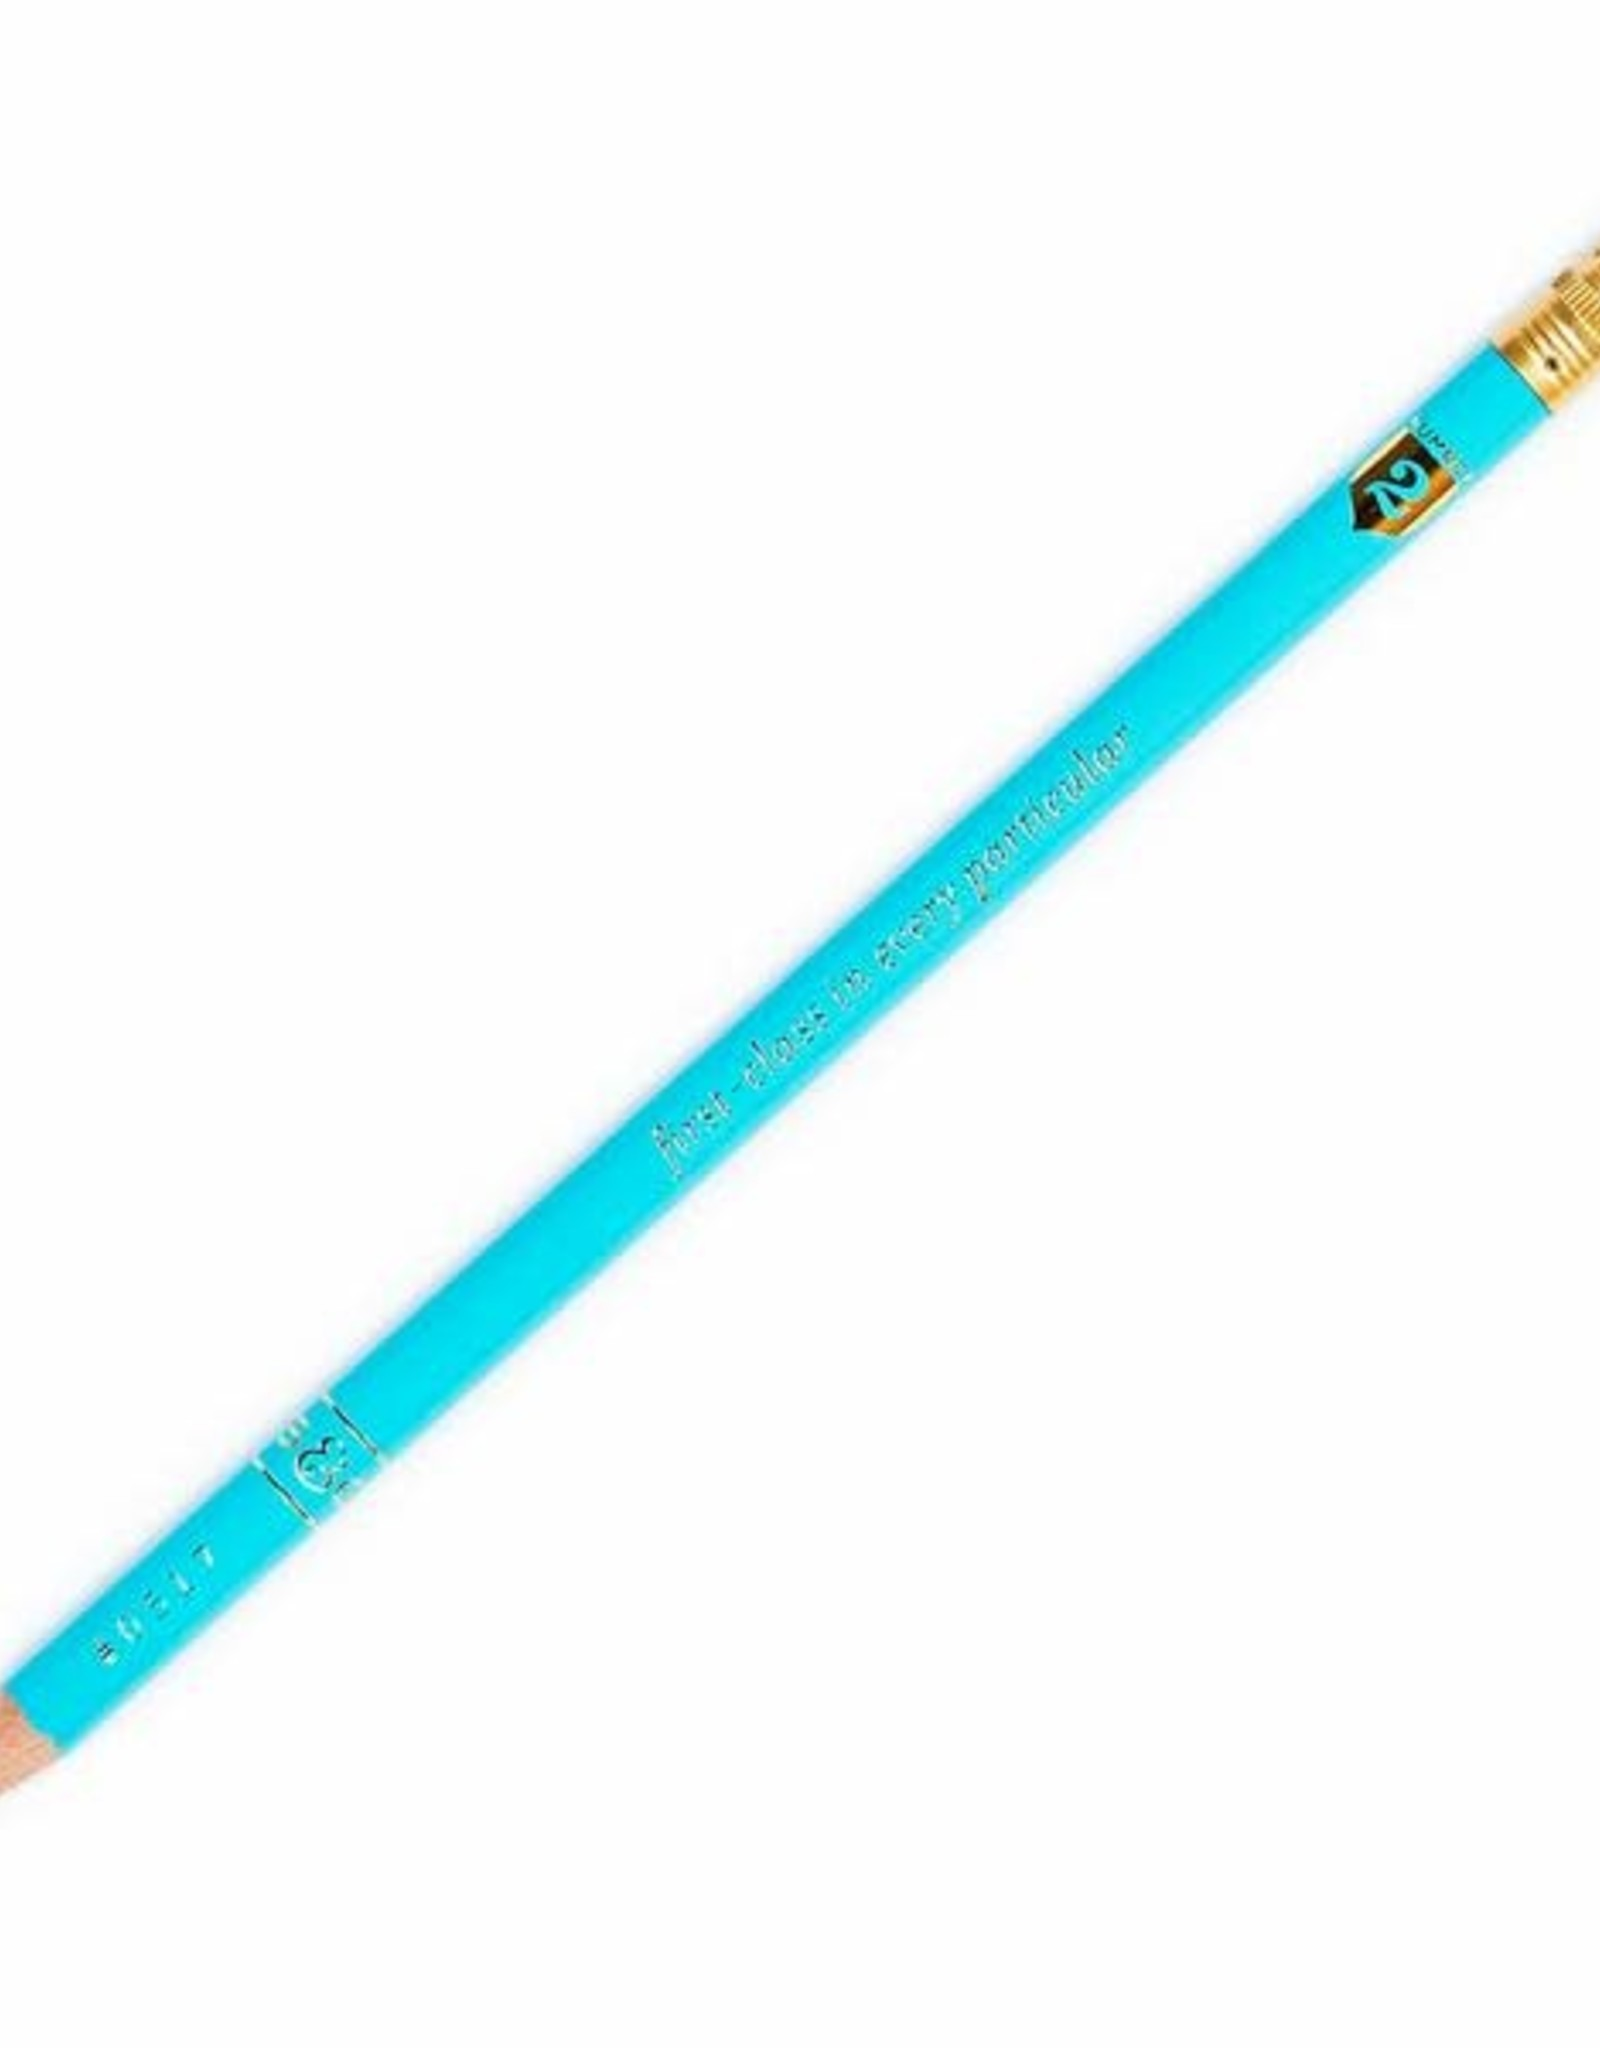 Snow & Graham Turqoise Pencil Single